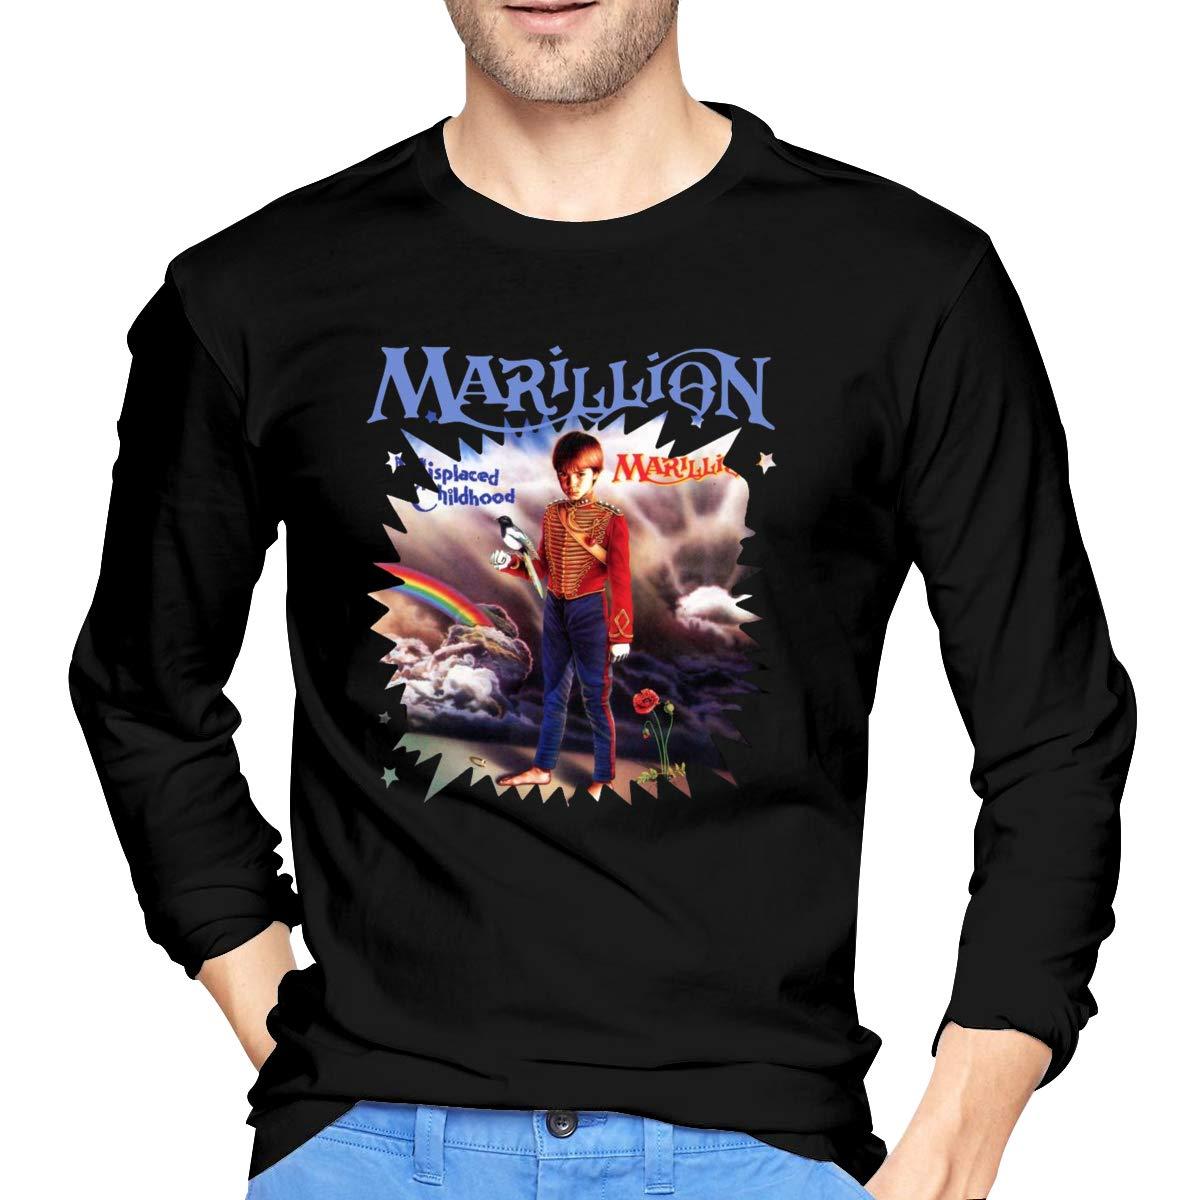 S Marillion Misplaced Childhood Round Neck Differentiate Tee Black Shirts